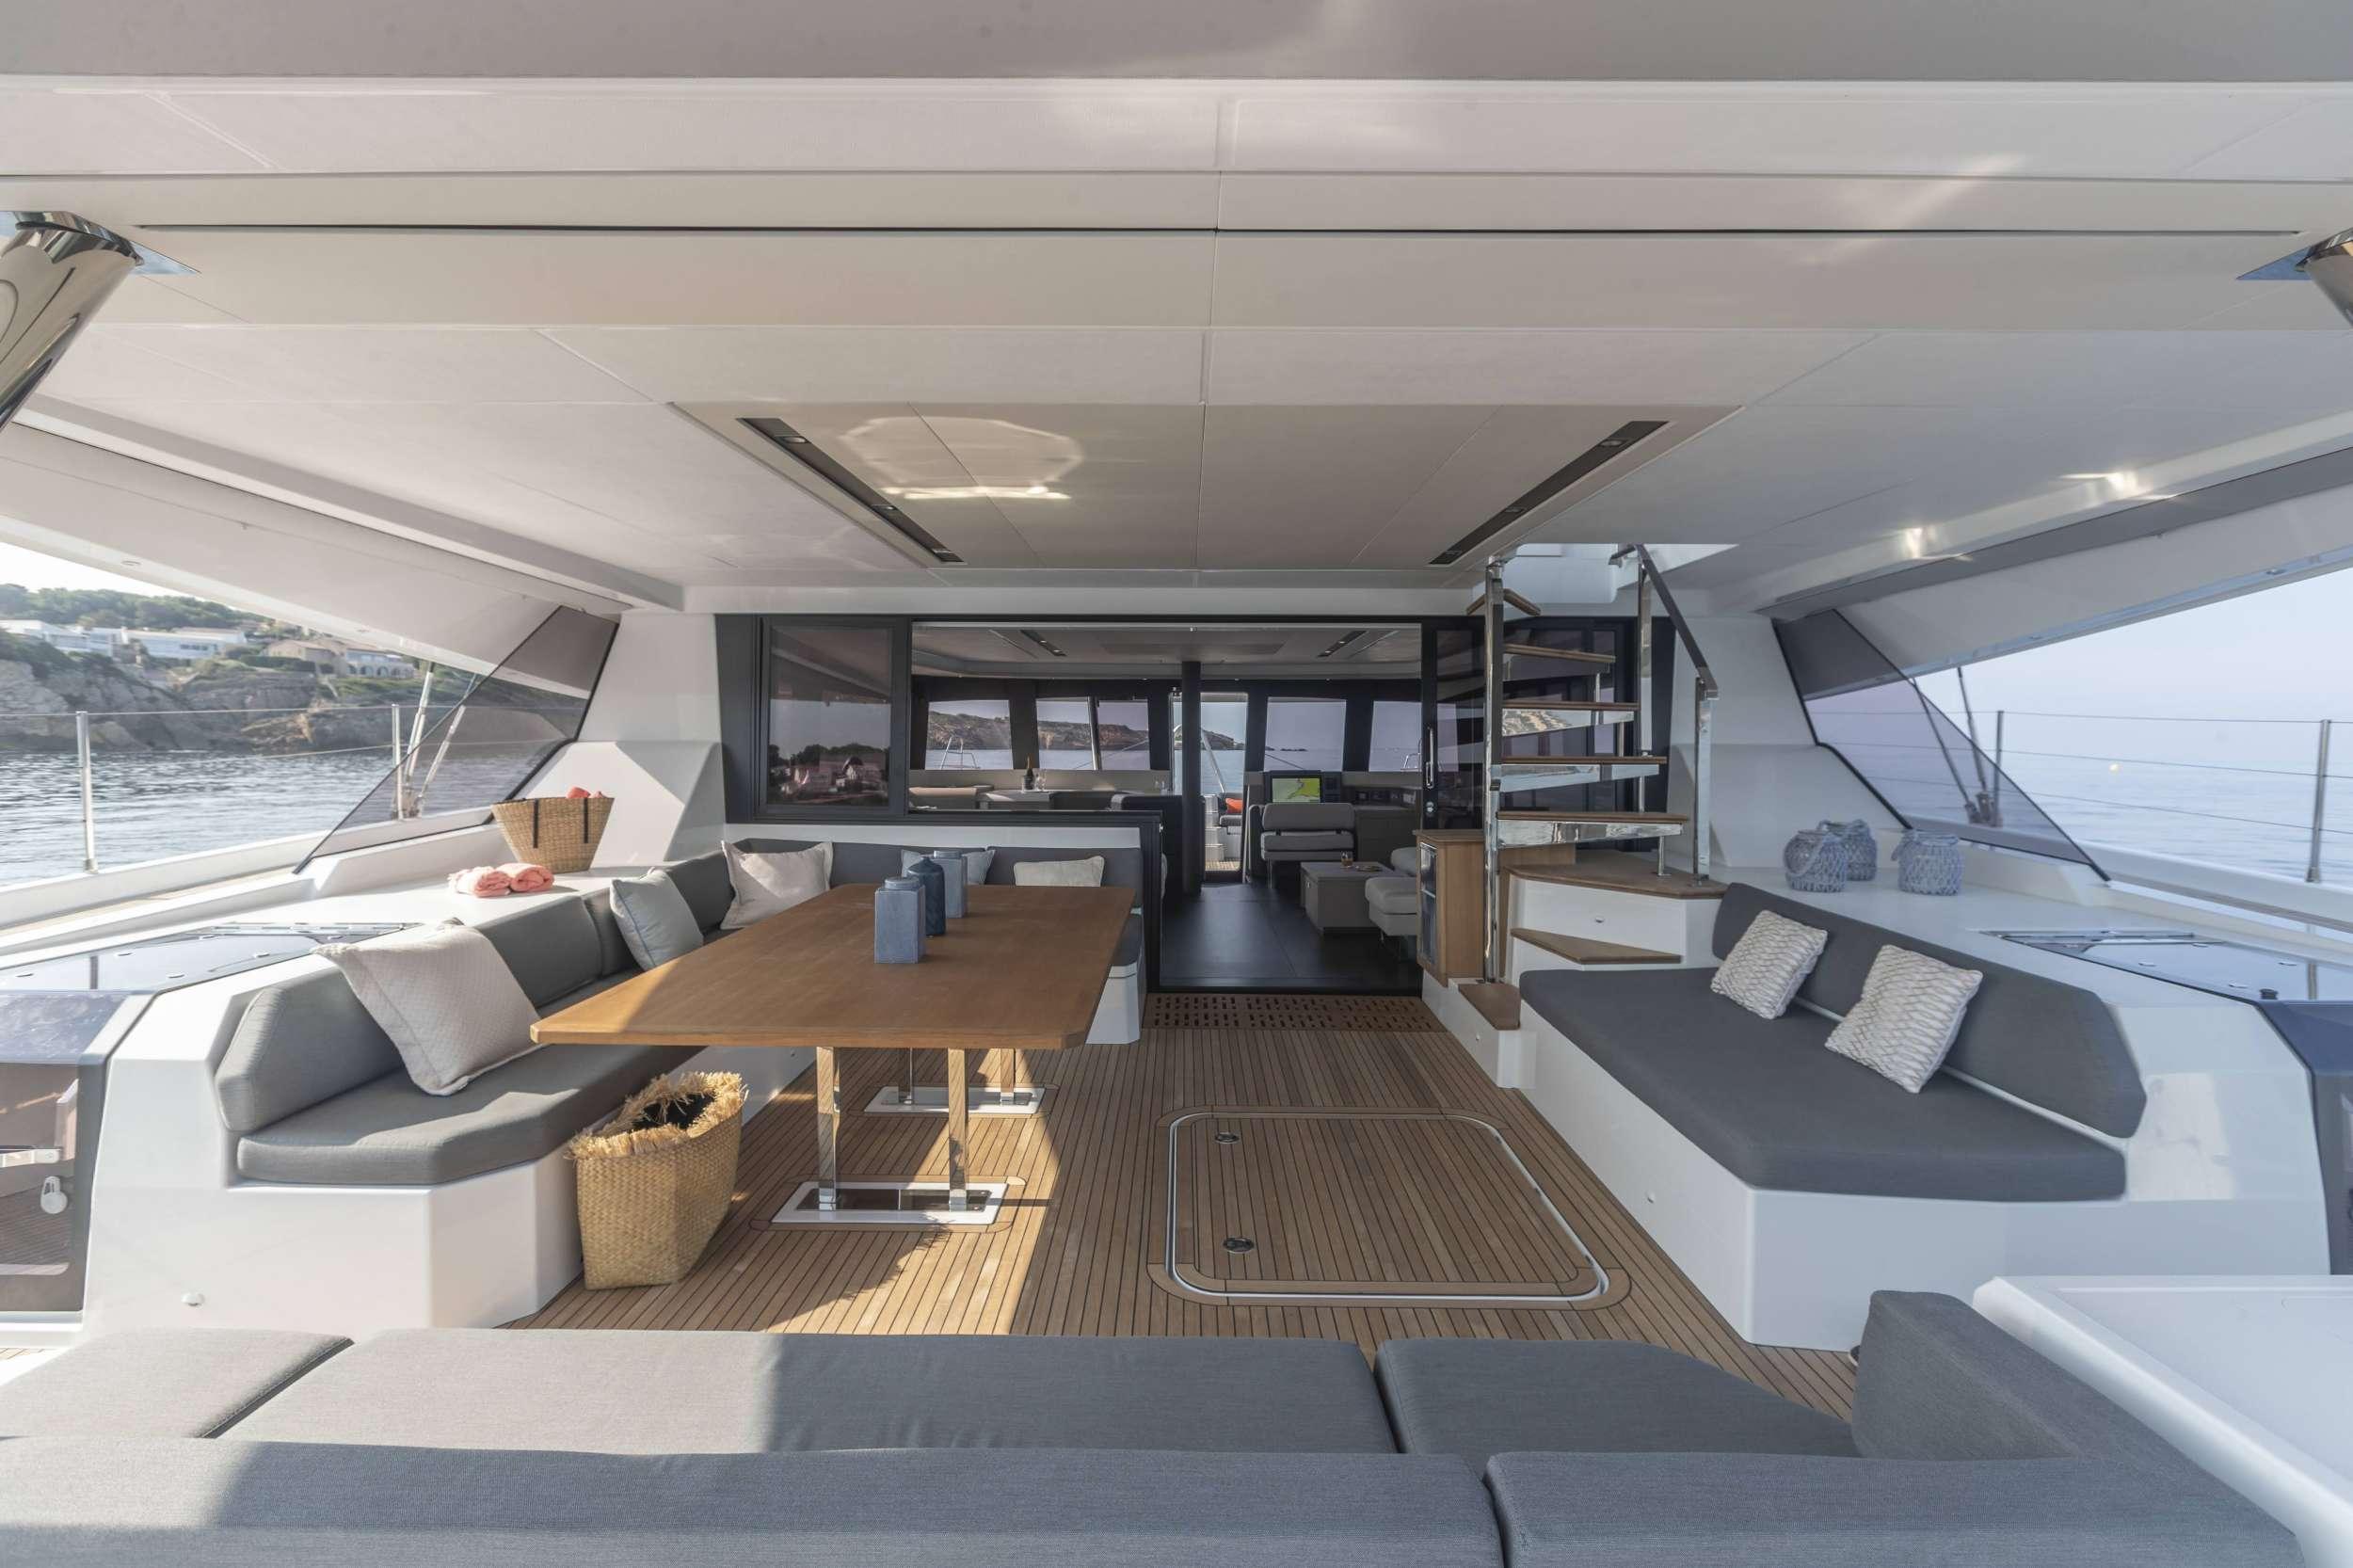 Spacious Aft Deck Living Area